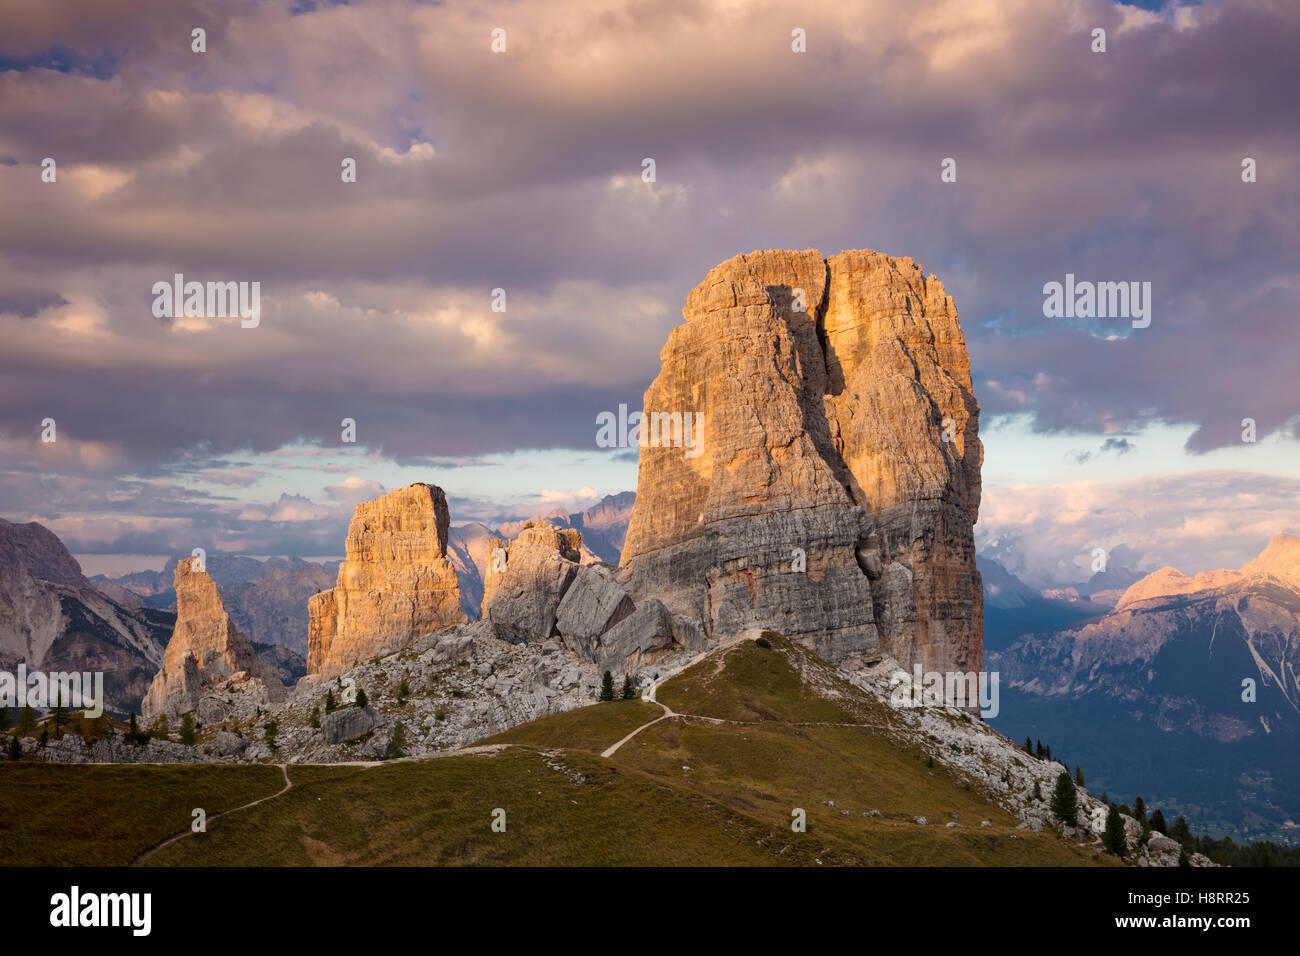 Evening sunlight over the Cinque Torri, Dolomite Mountains, Belluno, Veneto, Italy - Stock Image